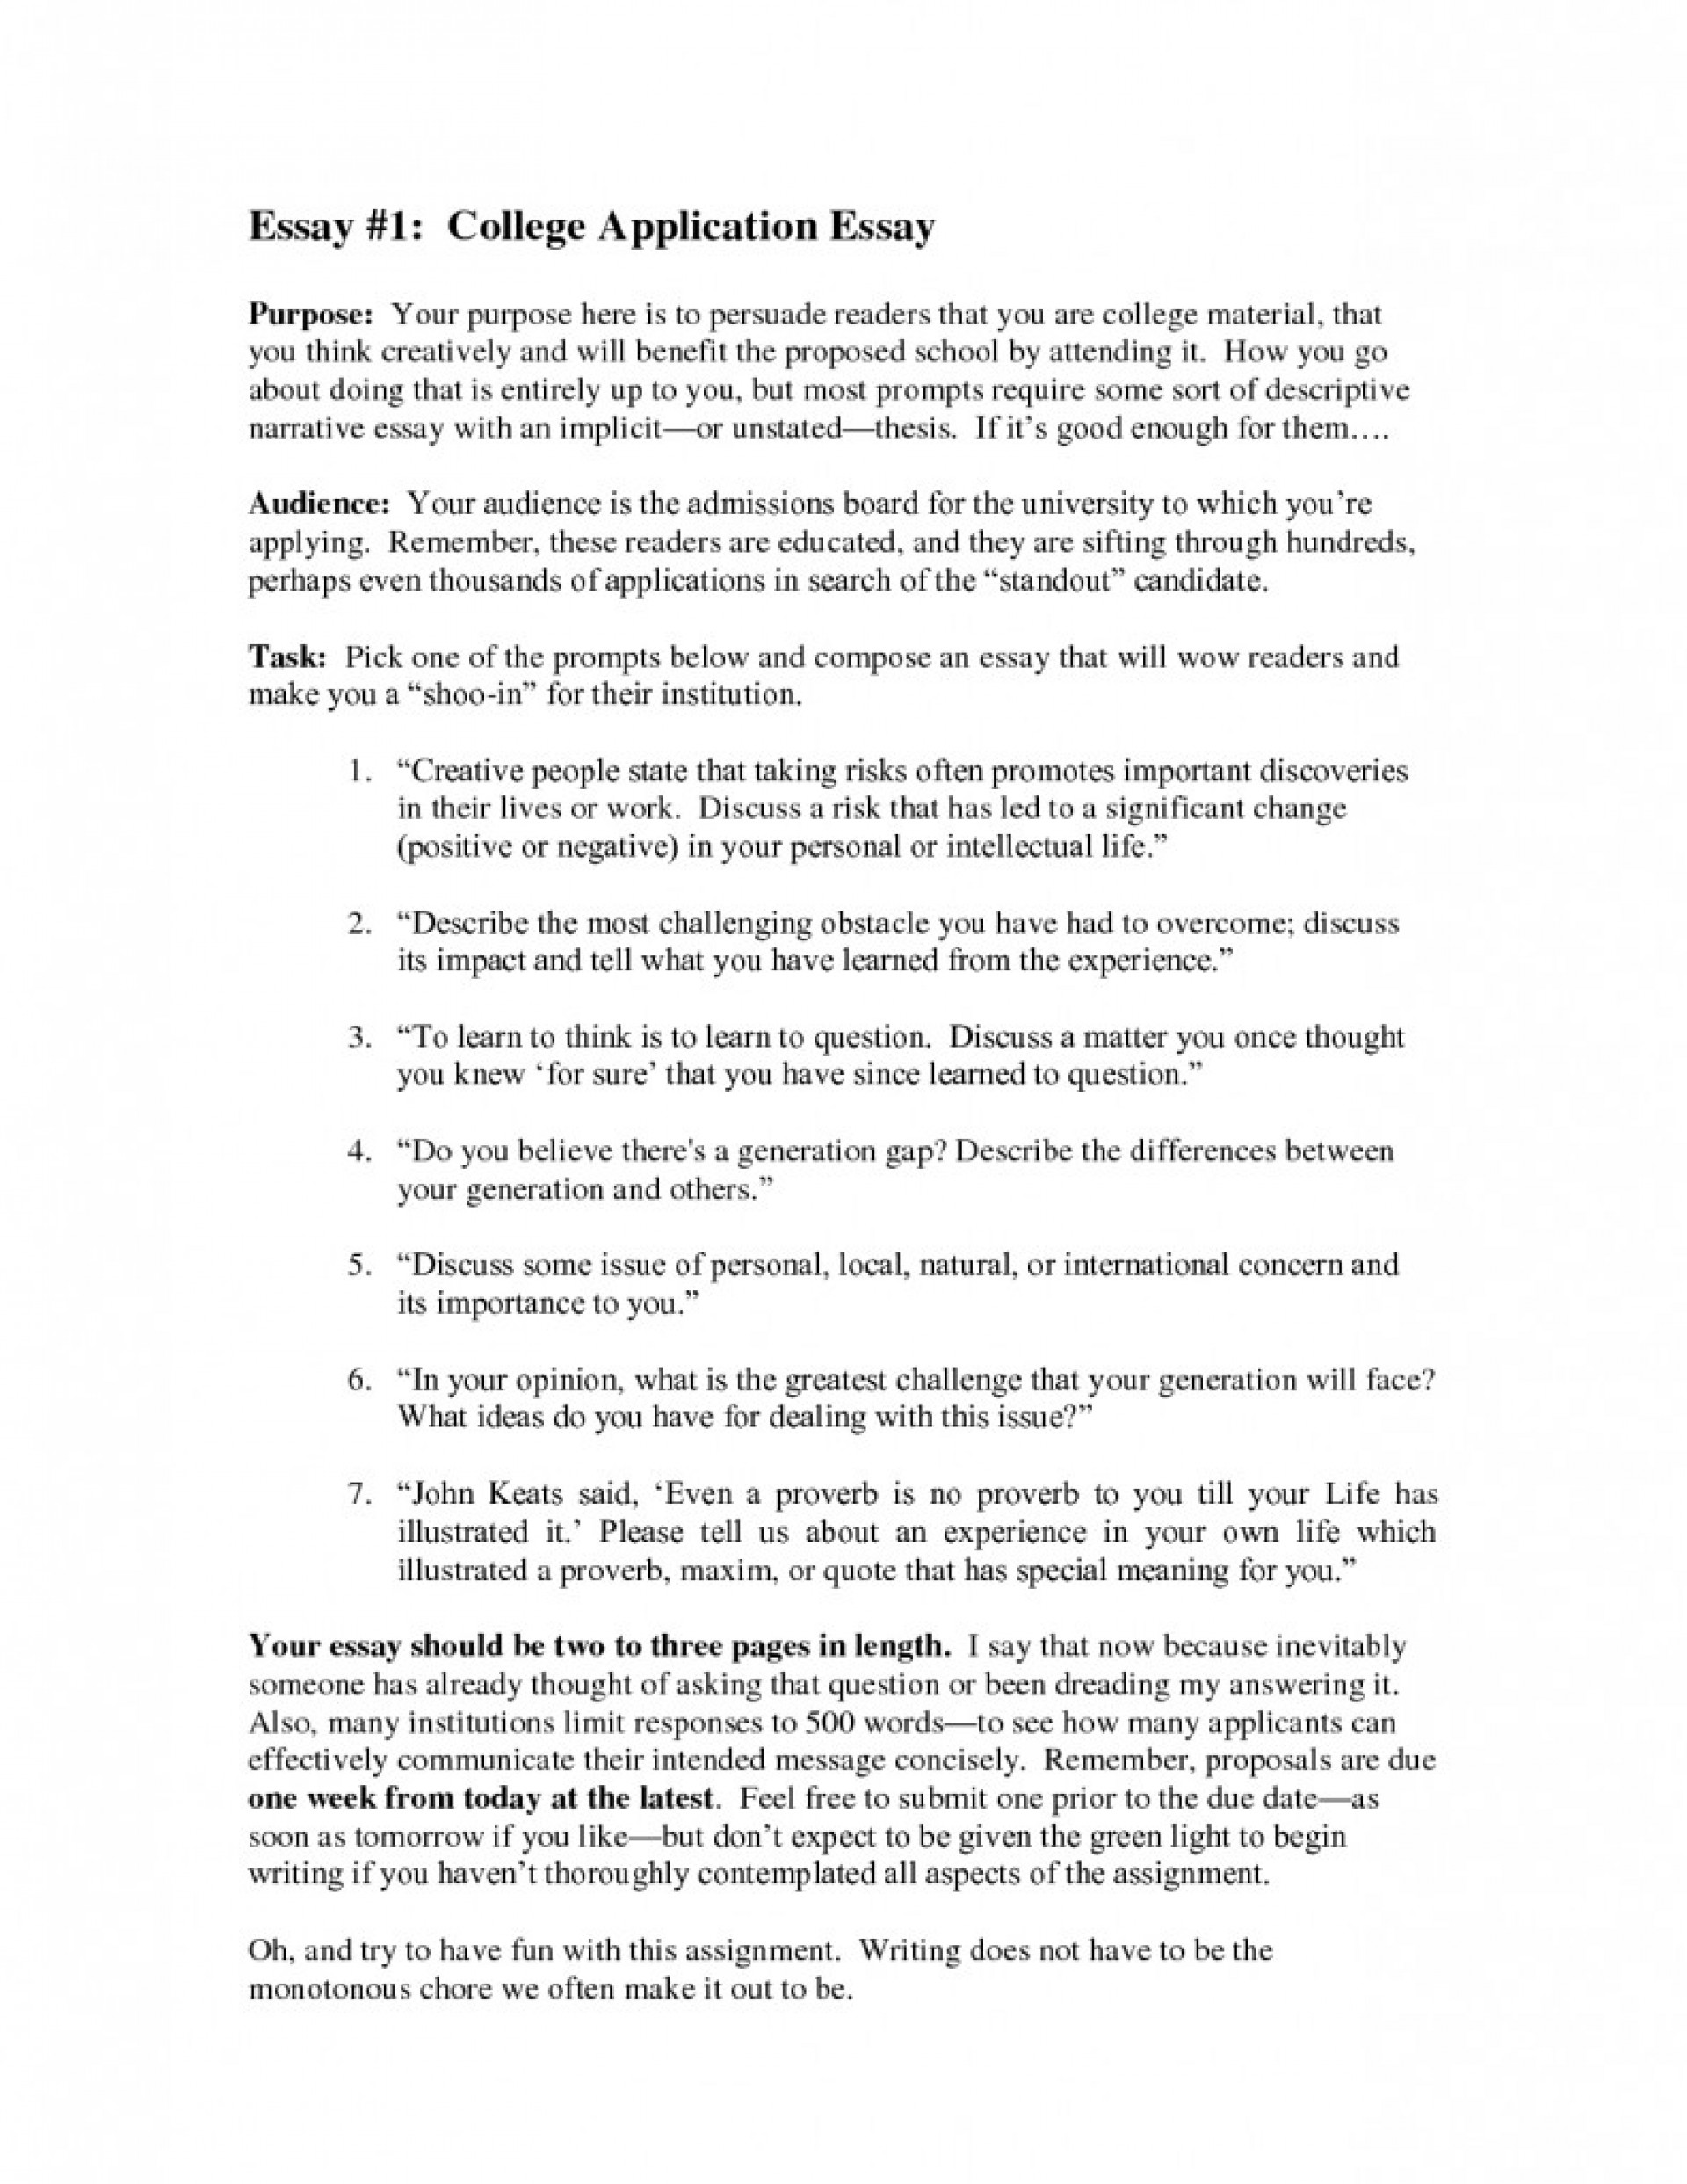 004 College Application Essay 791x1024 Writing Imposing Service Reddit Custom Help 1920